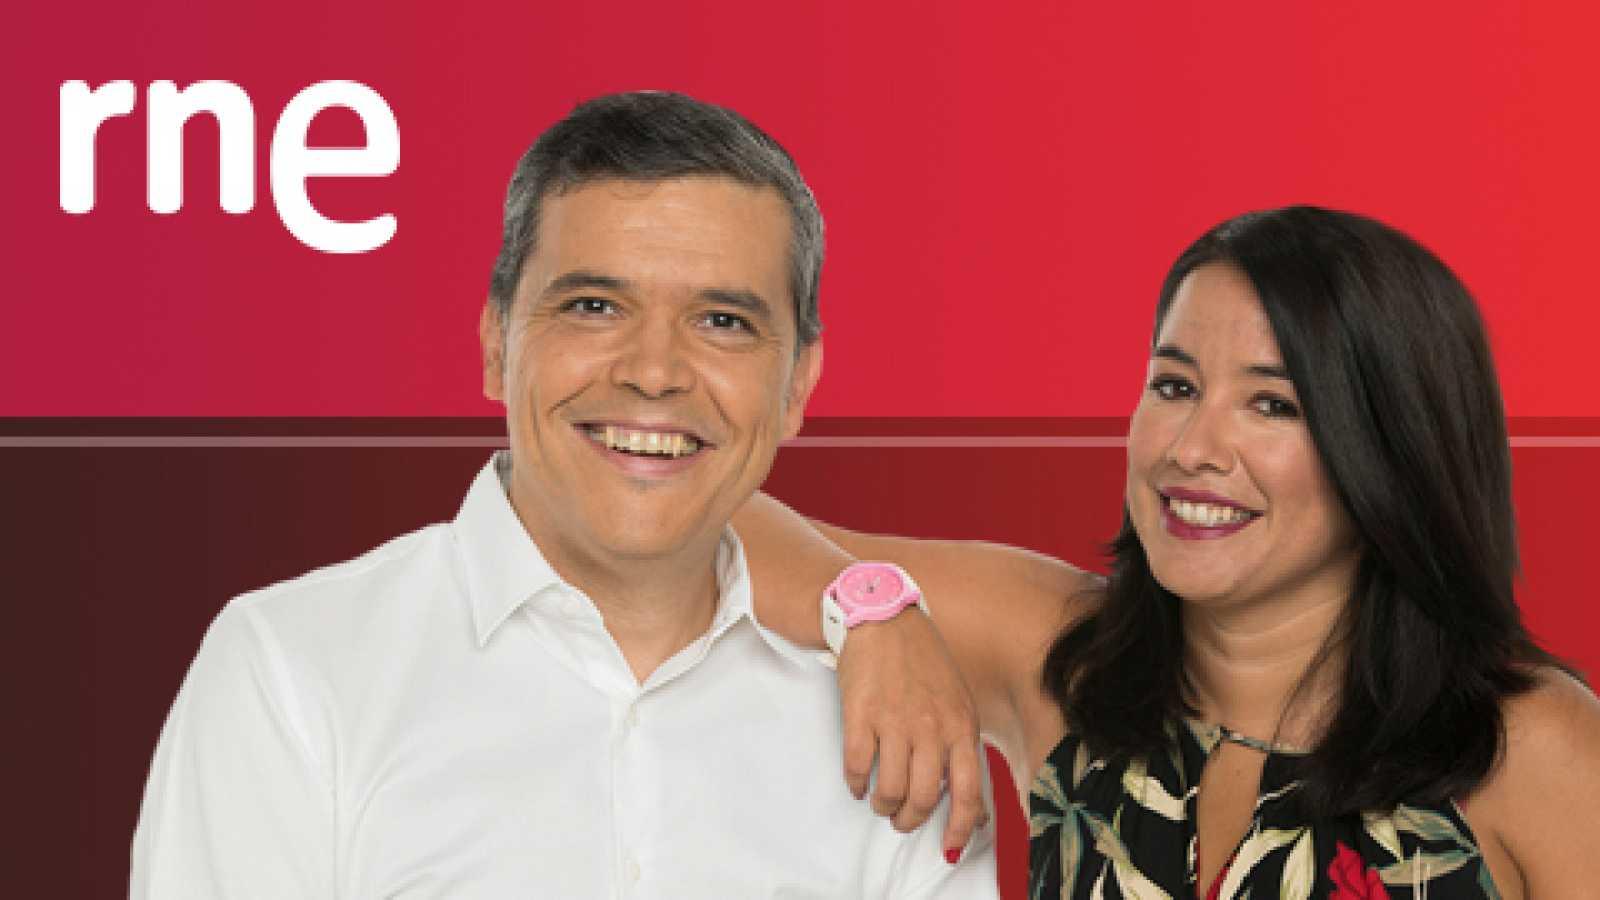 Las mañanas de RNE con Alfredo Menéndez - Segunda hora - 13/02/19 - escuchar ahora